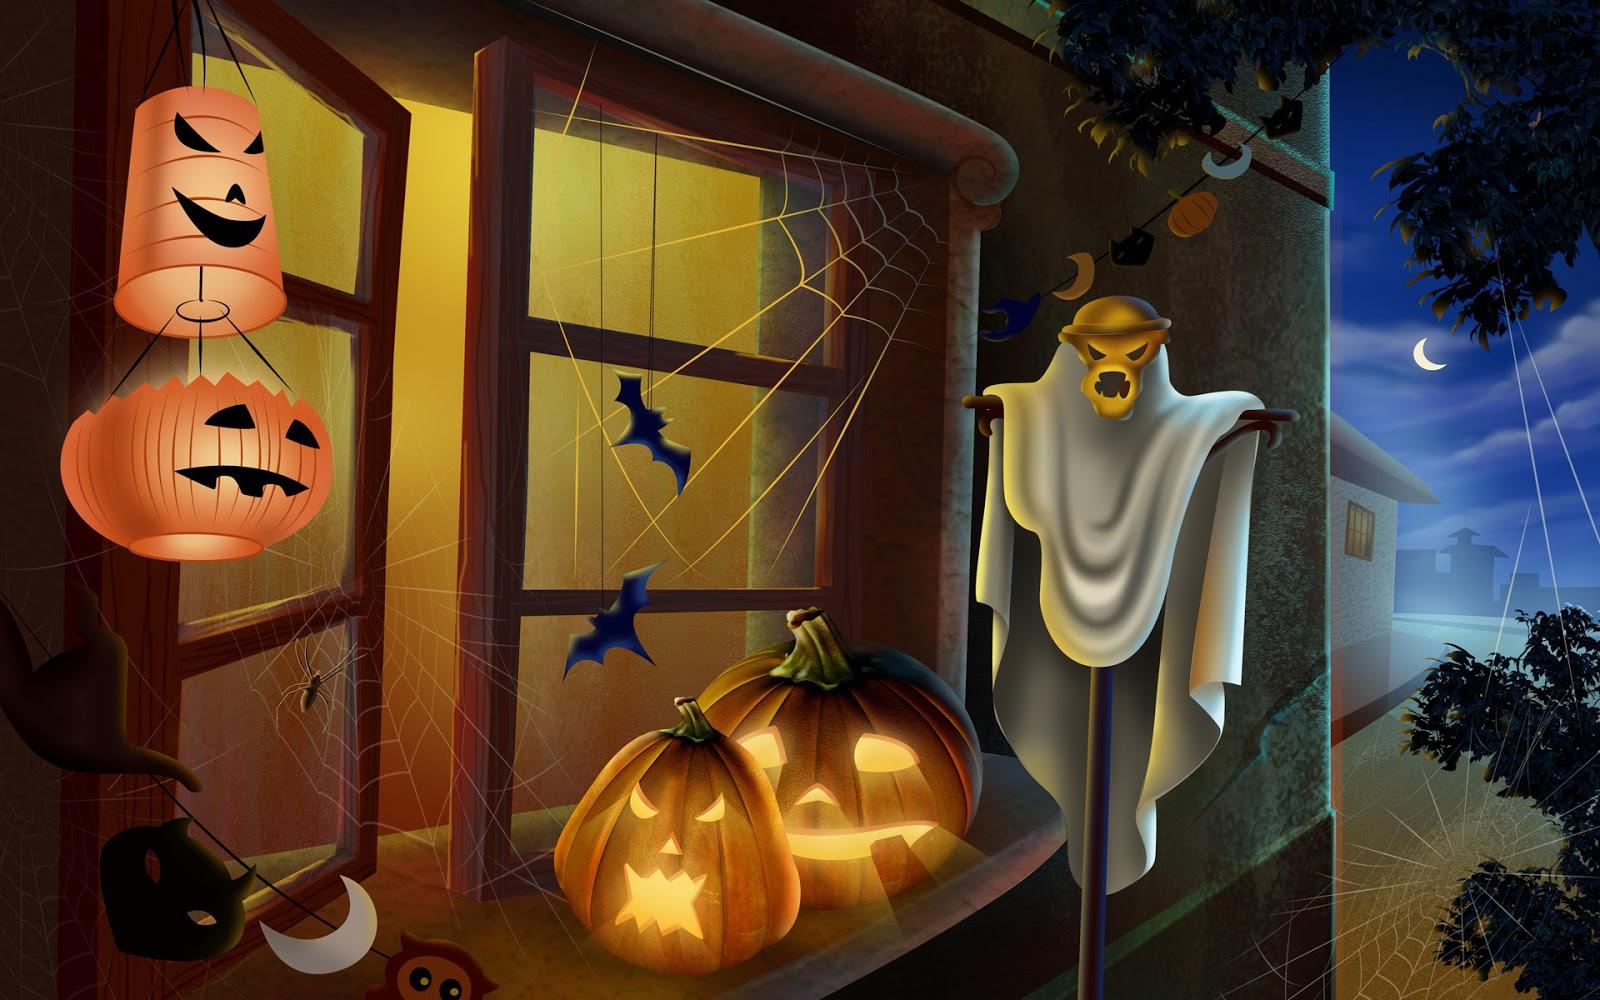 Scary Halloween Wallpaper for Halloween 2014